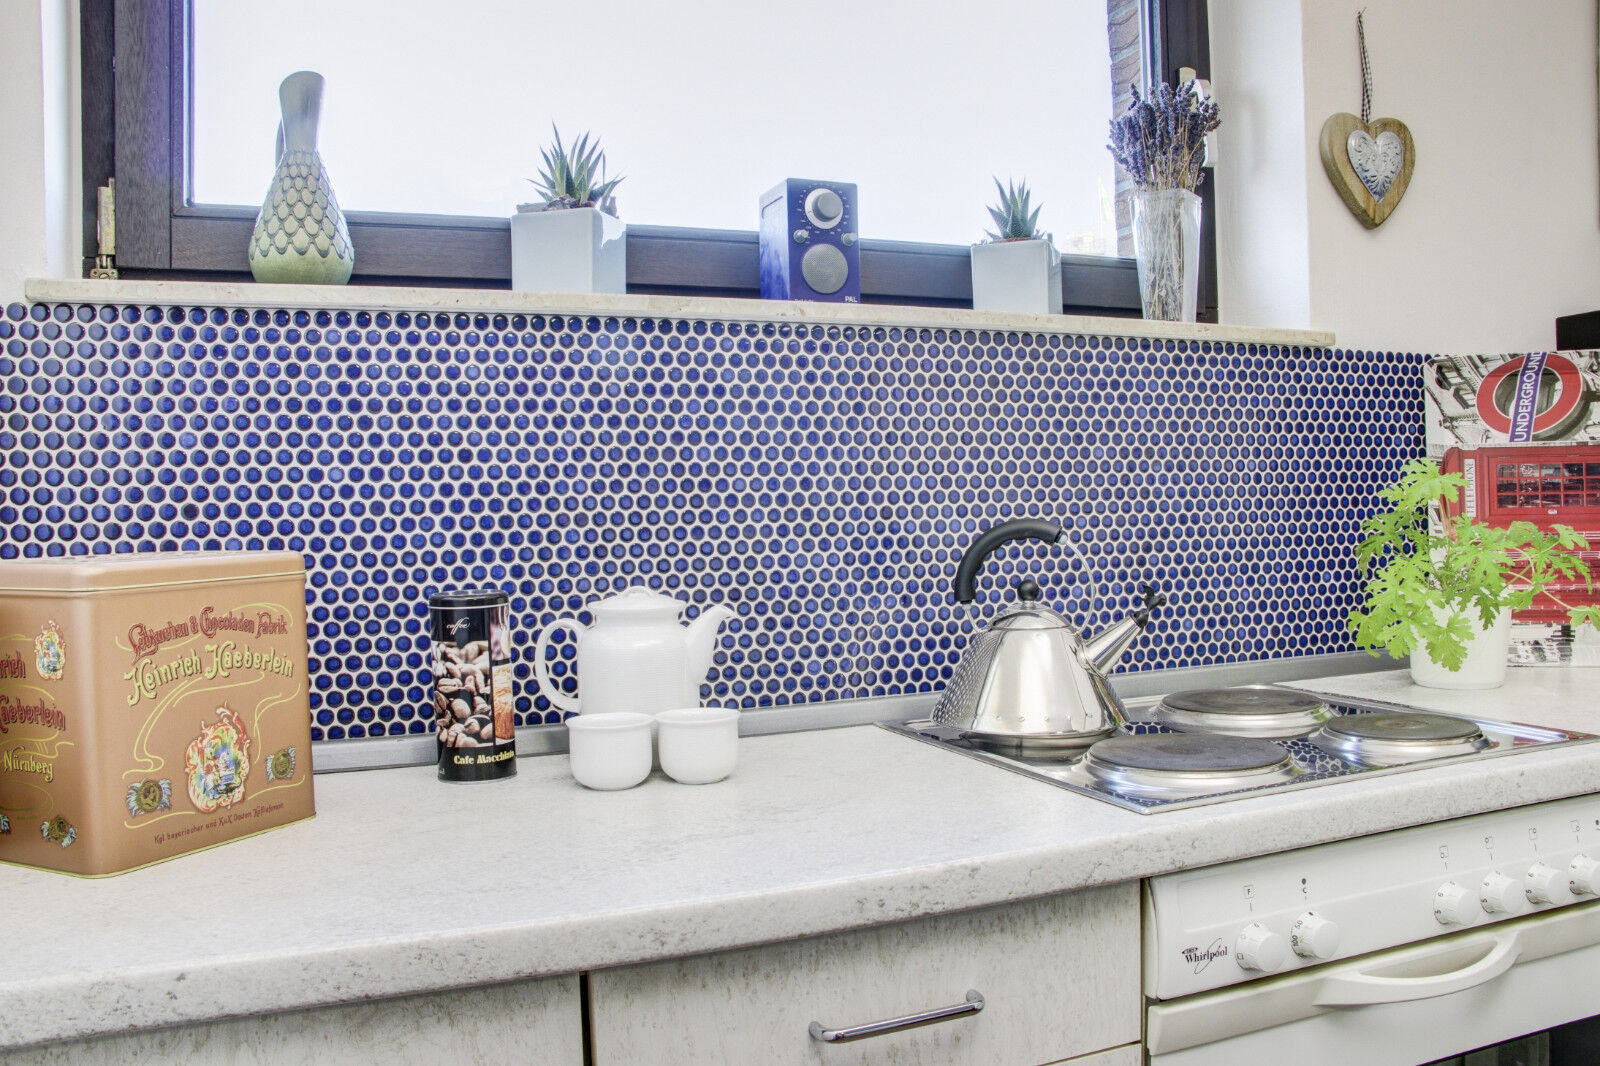 Fliesenspiegel Küche Keramik Mosaik Knopf kobaltblau glänzend Art ...